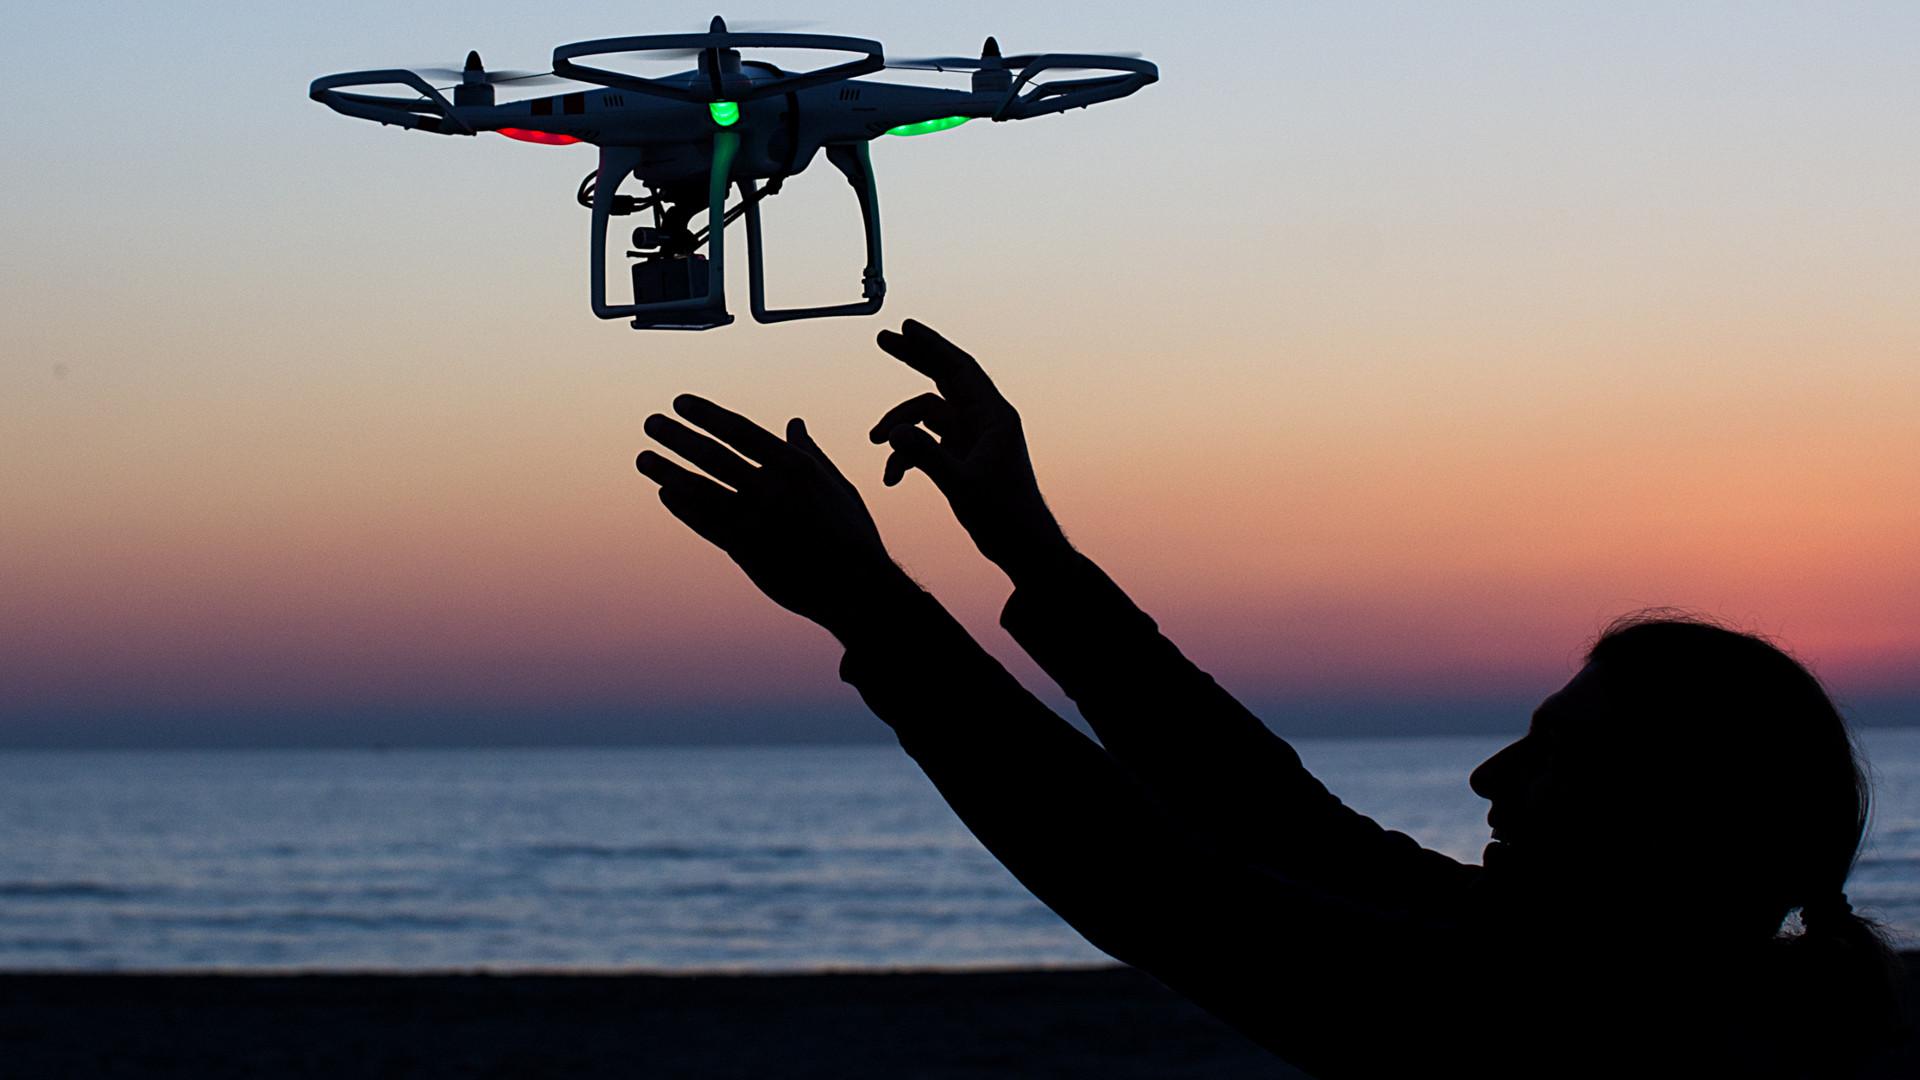 UgCS unico software per controllare diversi droni - DronEzine